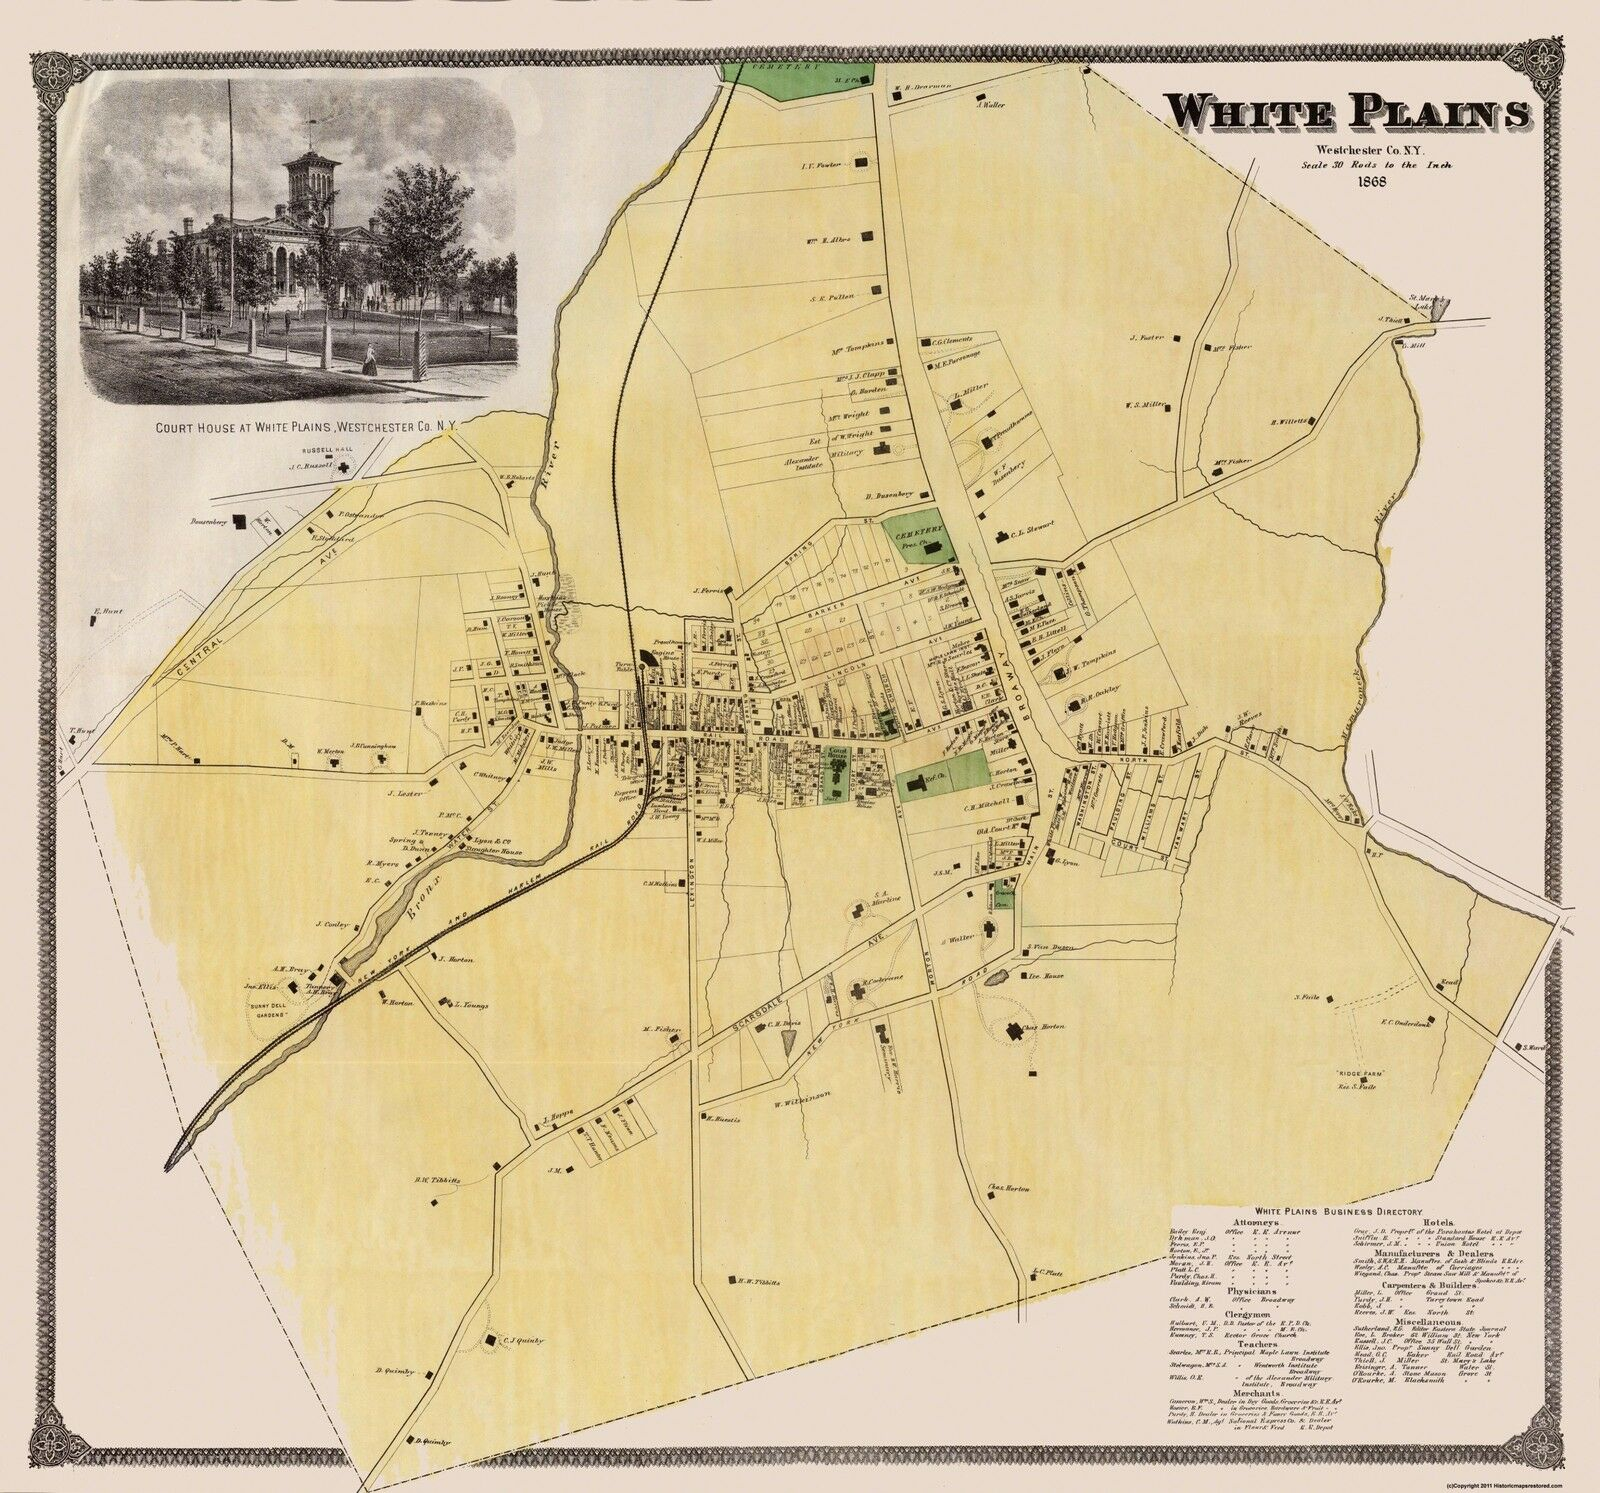 Map White Plains New York City